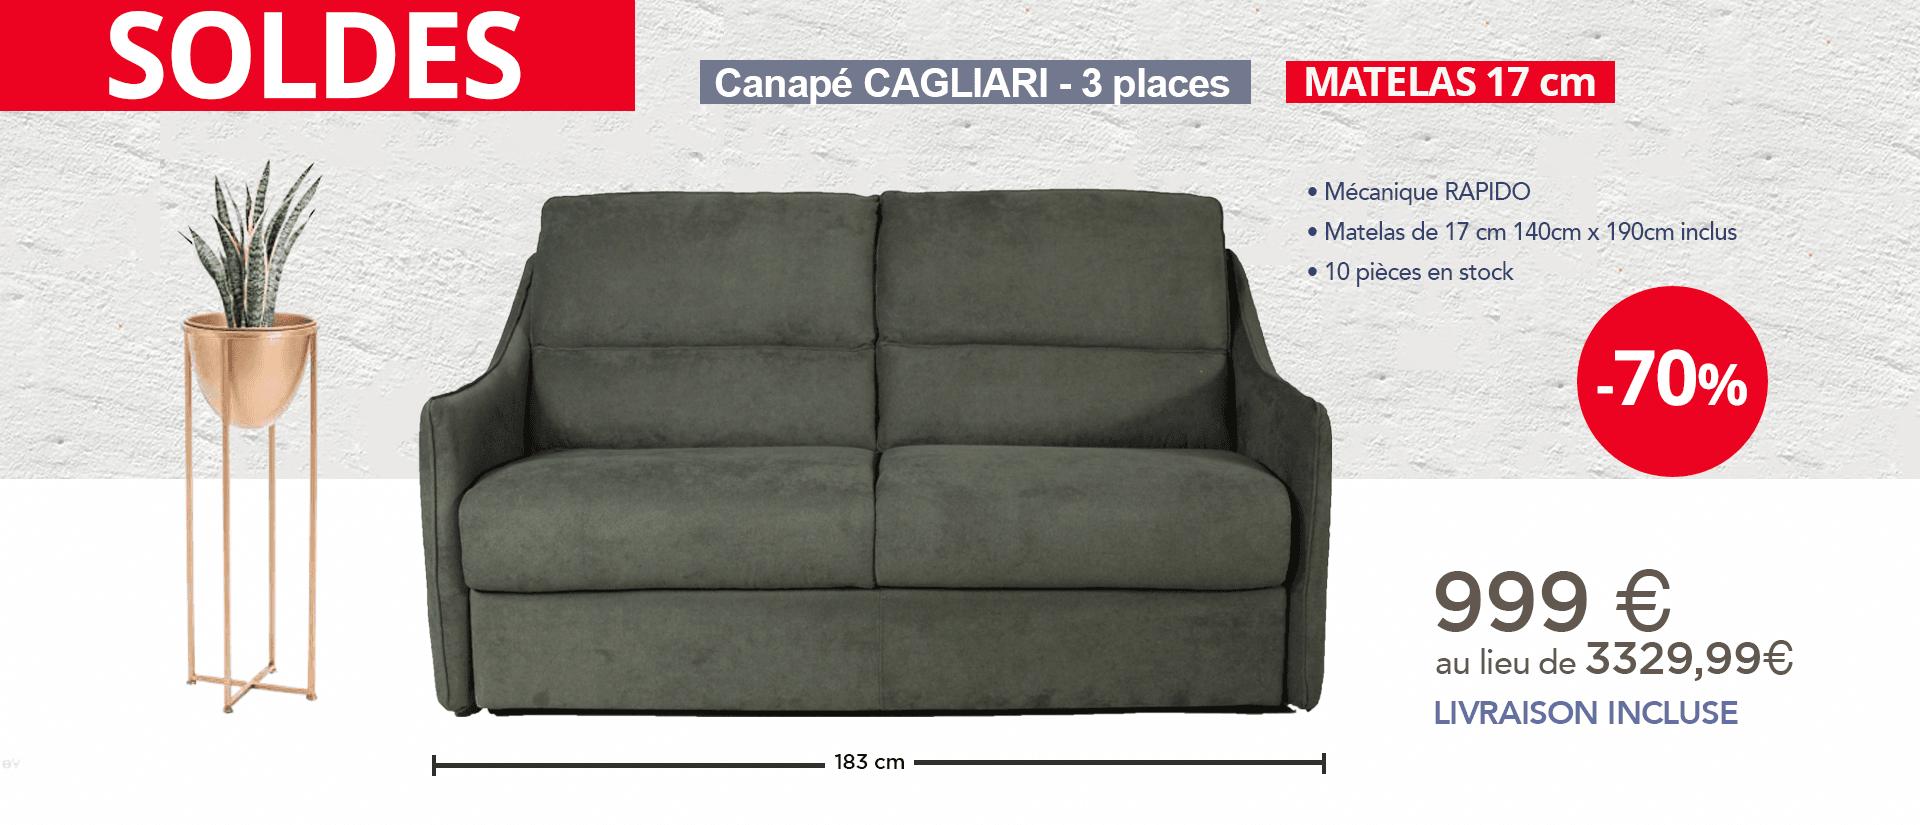 Cagliari mécanique rapido couchage 140 avec matelas de 17cm